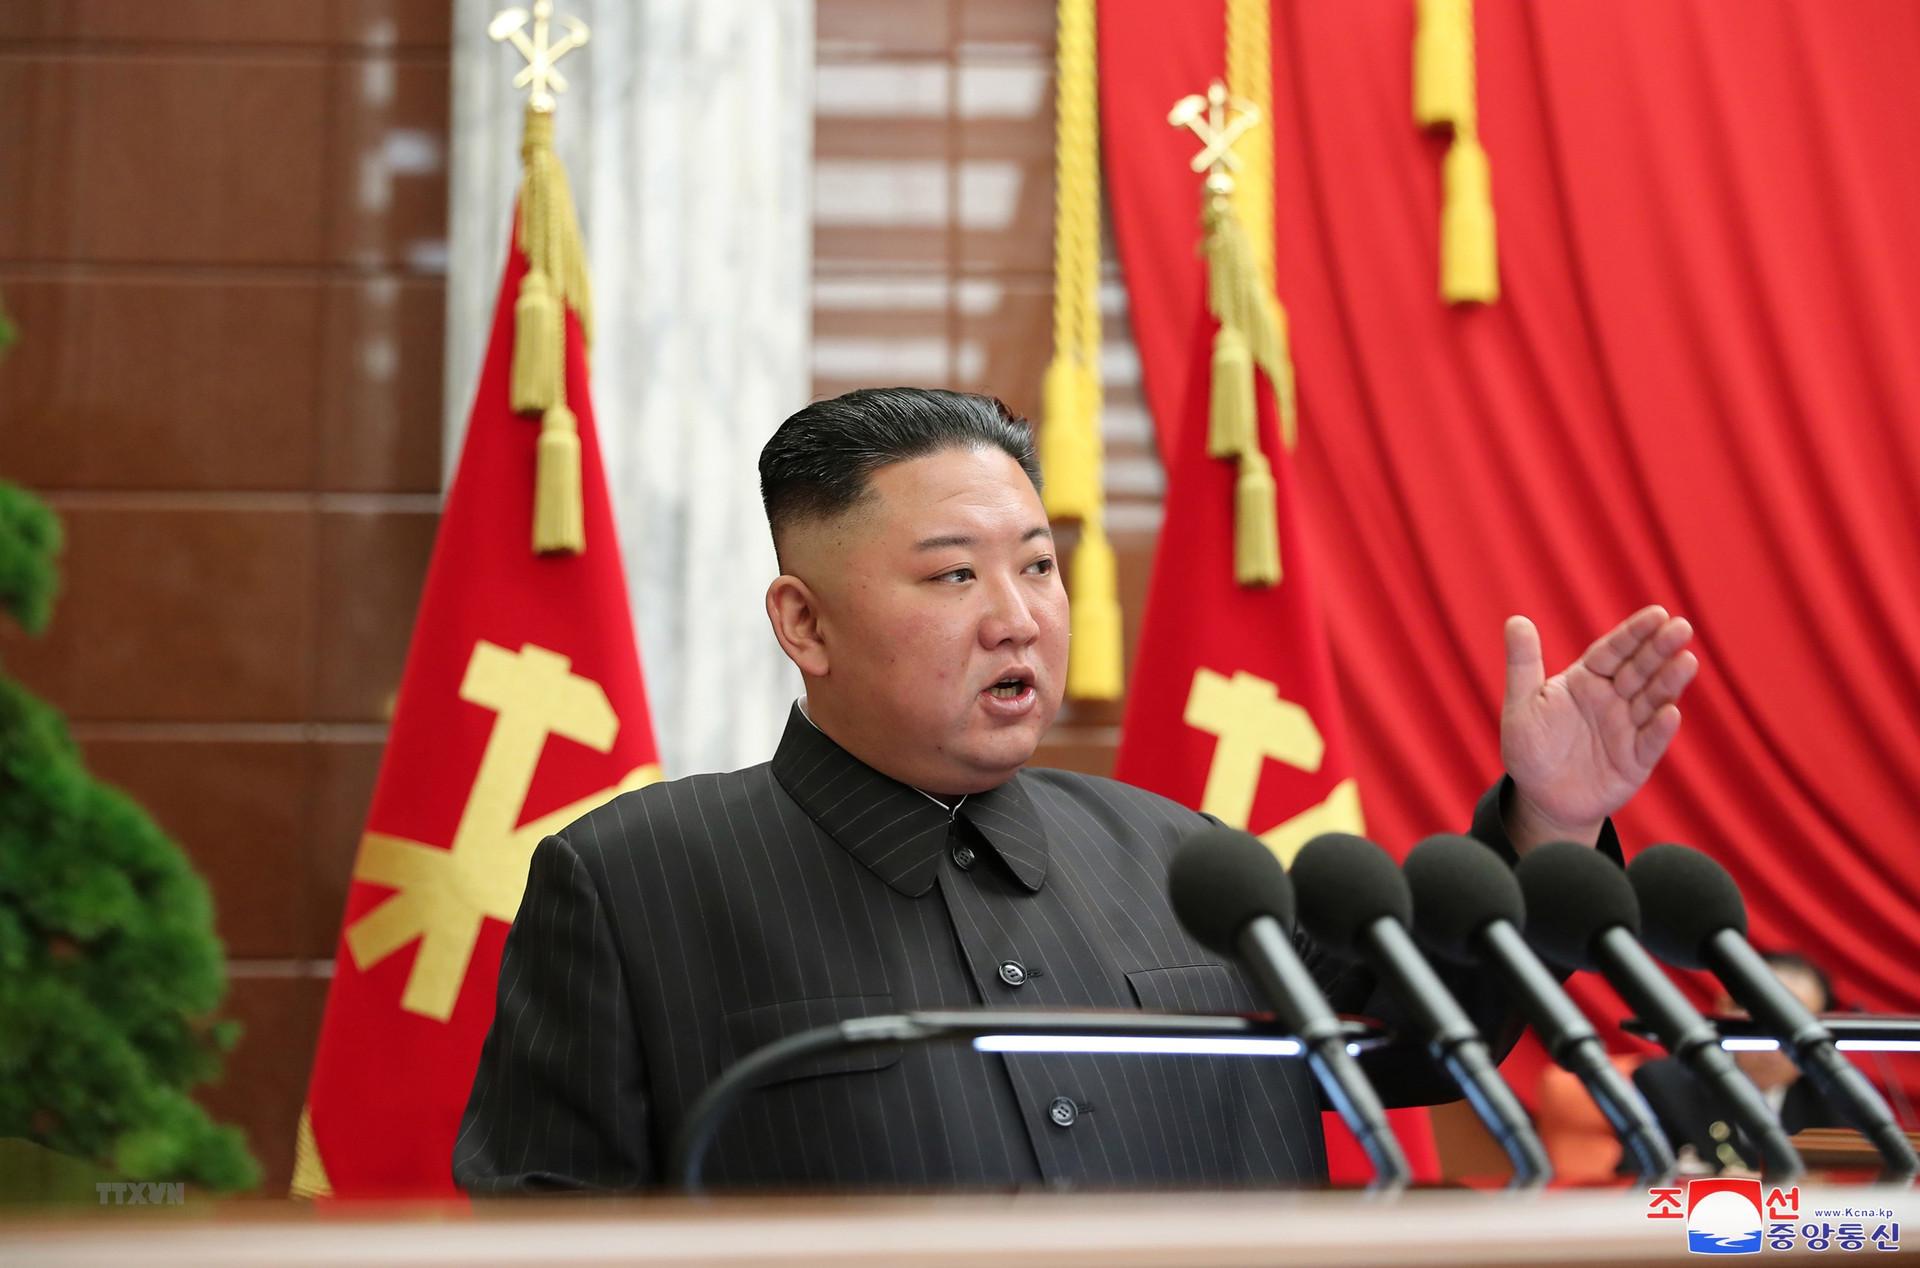 Ong Kim Jong-un chi ra su co nghiem trong trong cuoc chien COVID-19 hinh anh 1